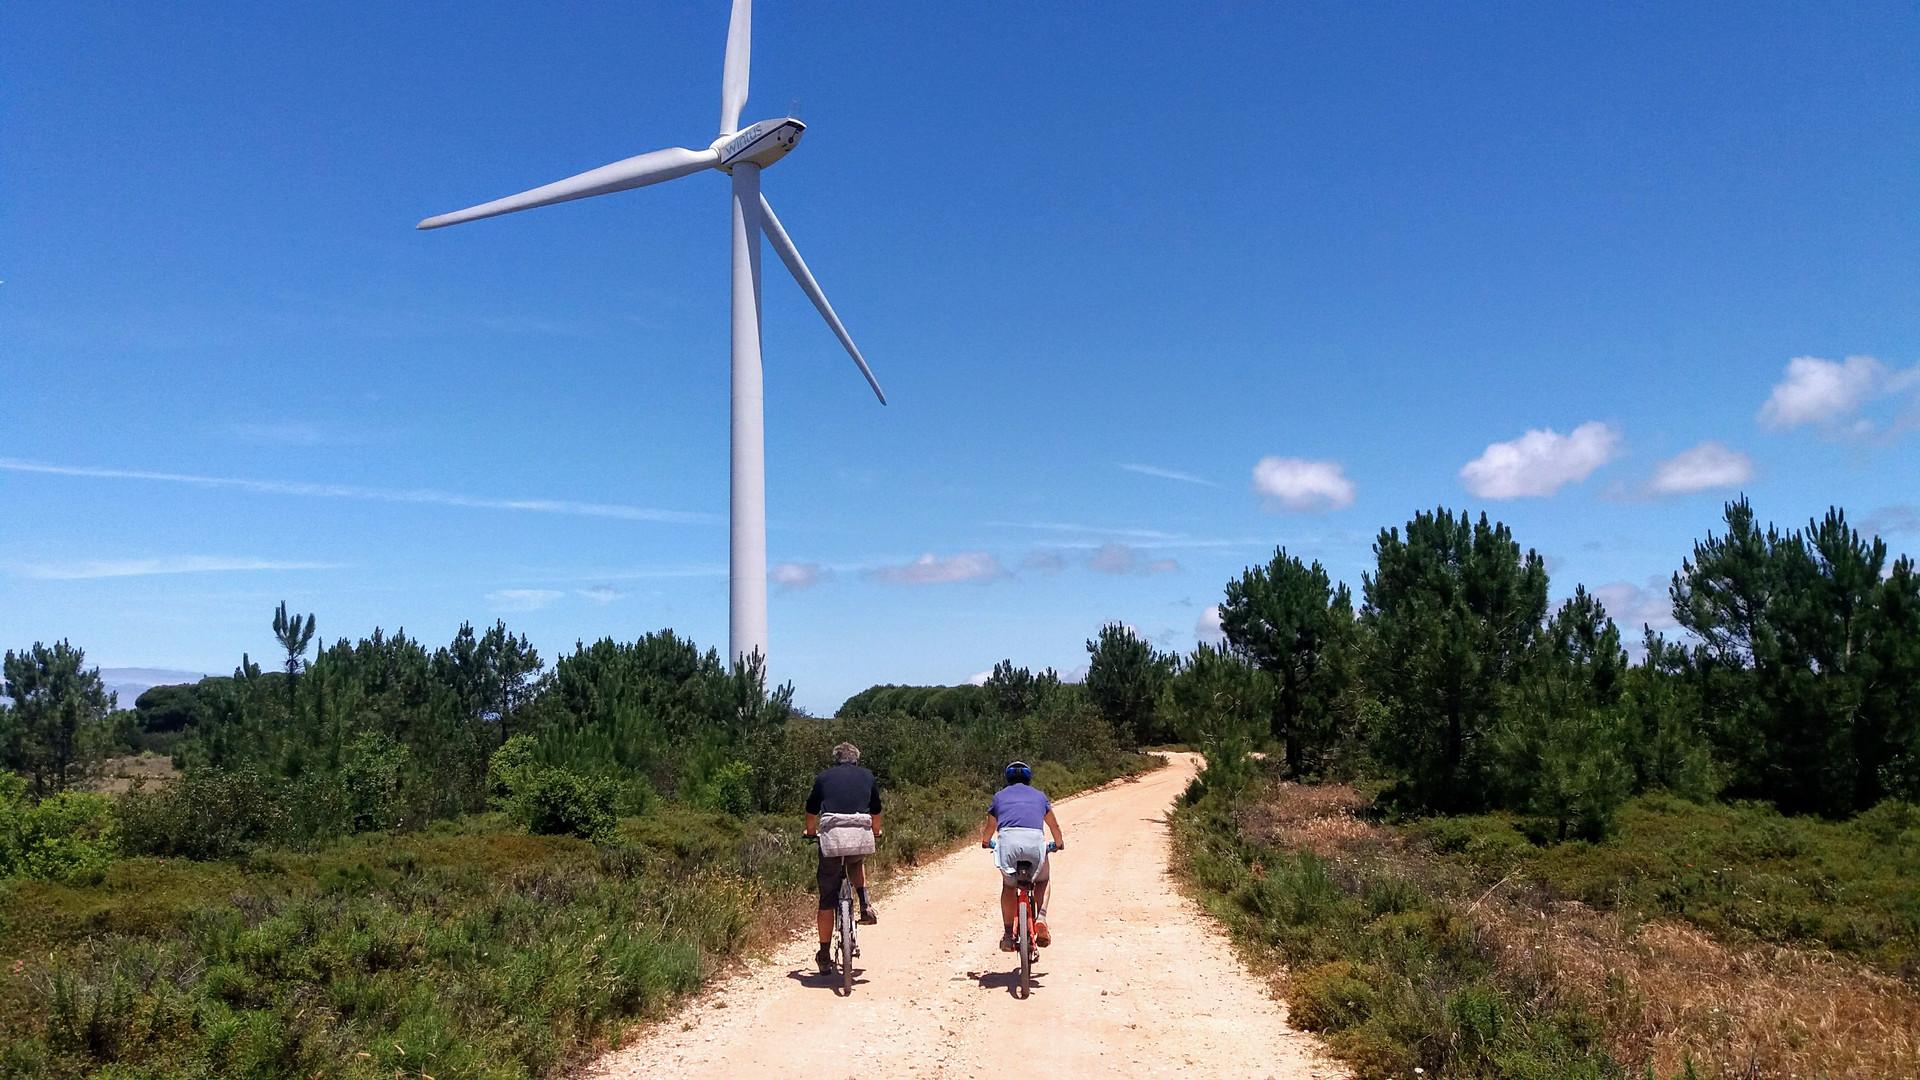 Biking next to wind turbine